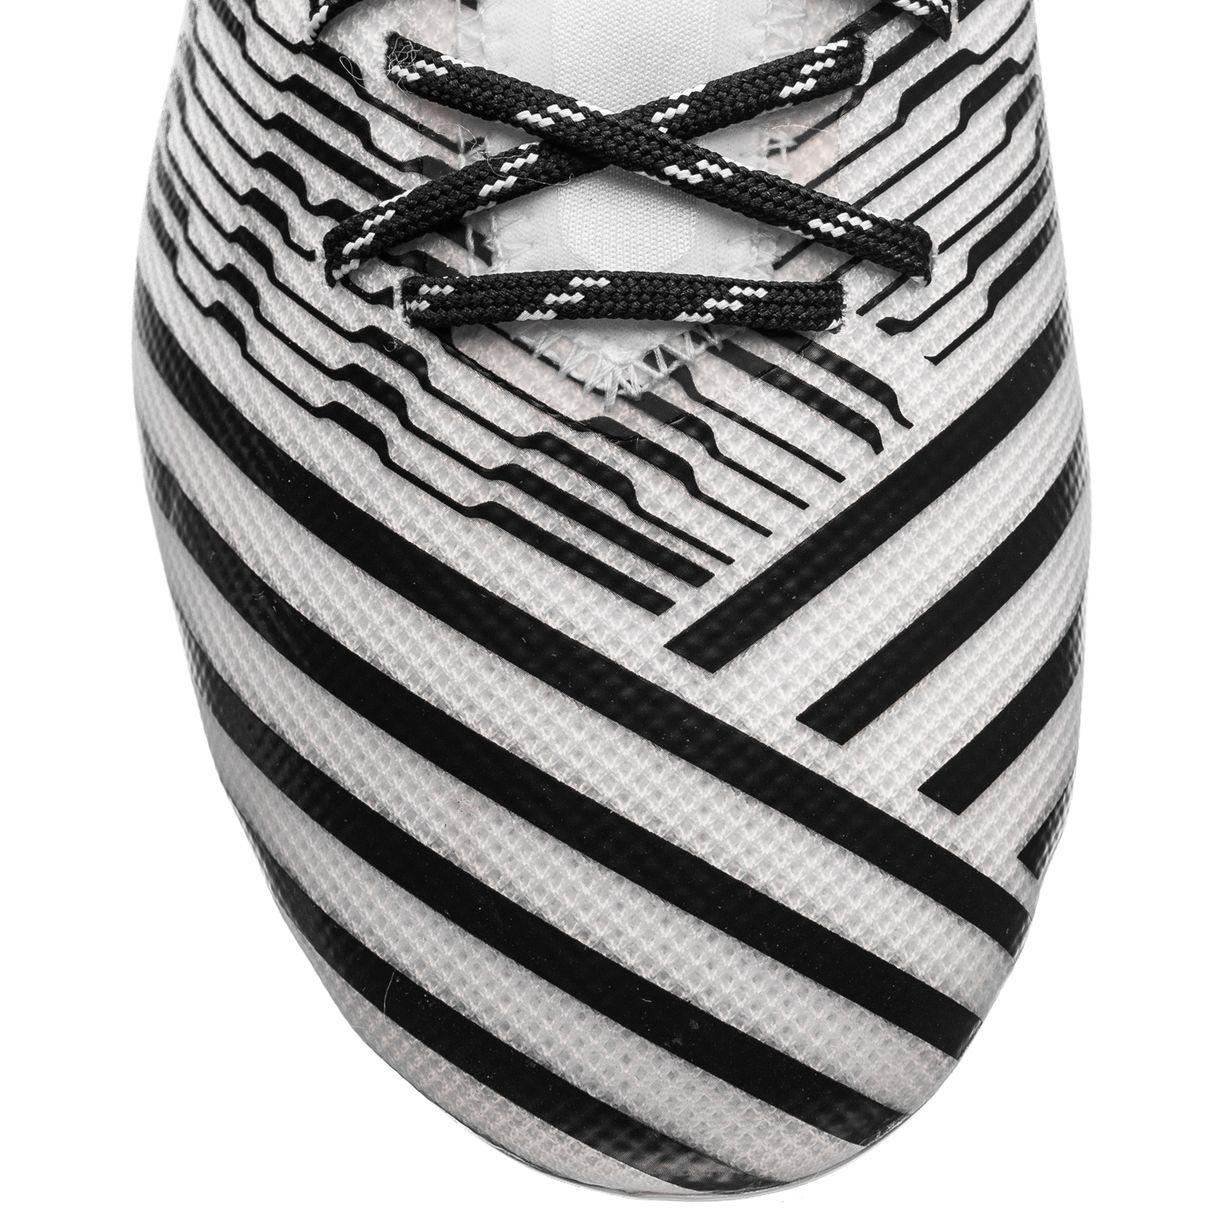 Adidas Nemeziz 17.3 špička kopačky